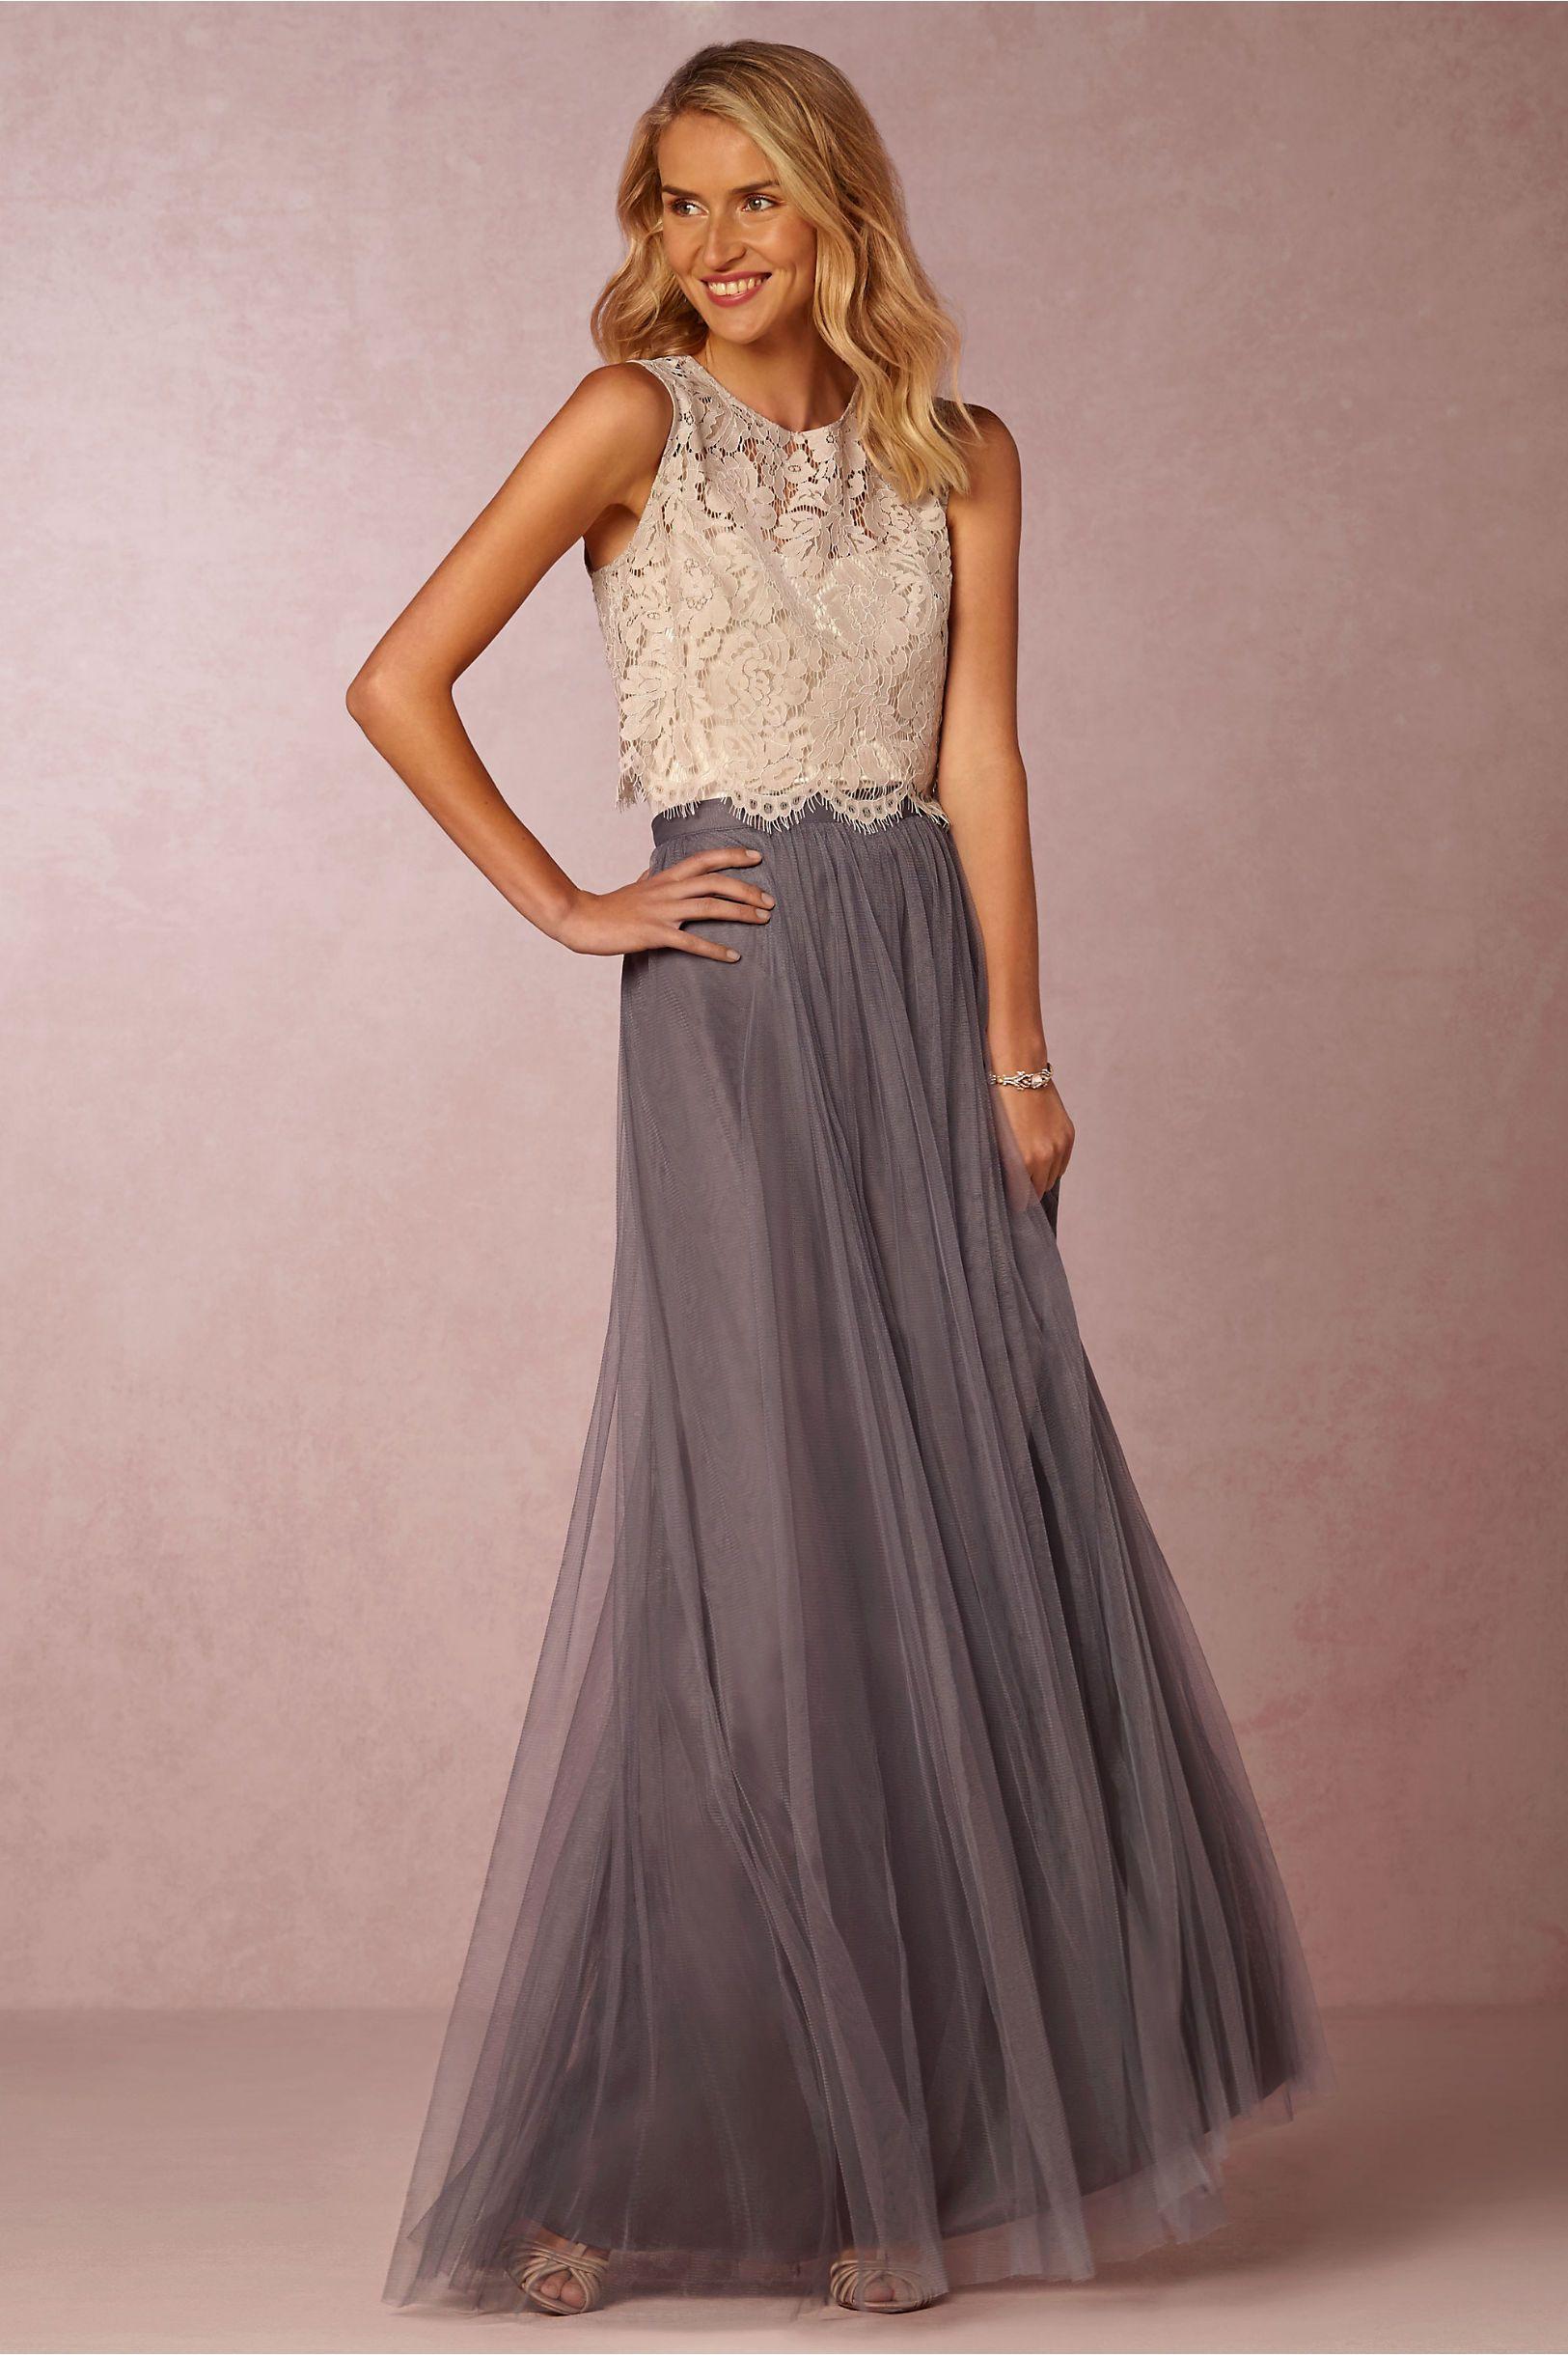 Jenny Yoo Cleo Top | Tulle Skirts | Kleid Hochzeit Gast